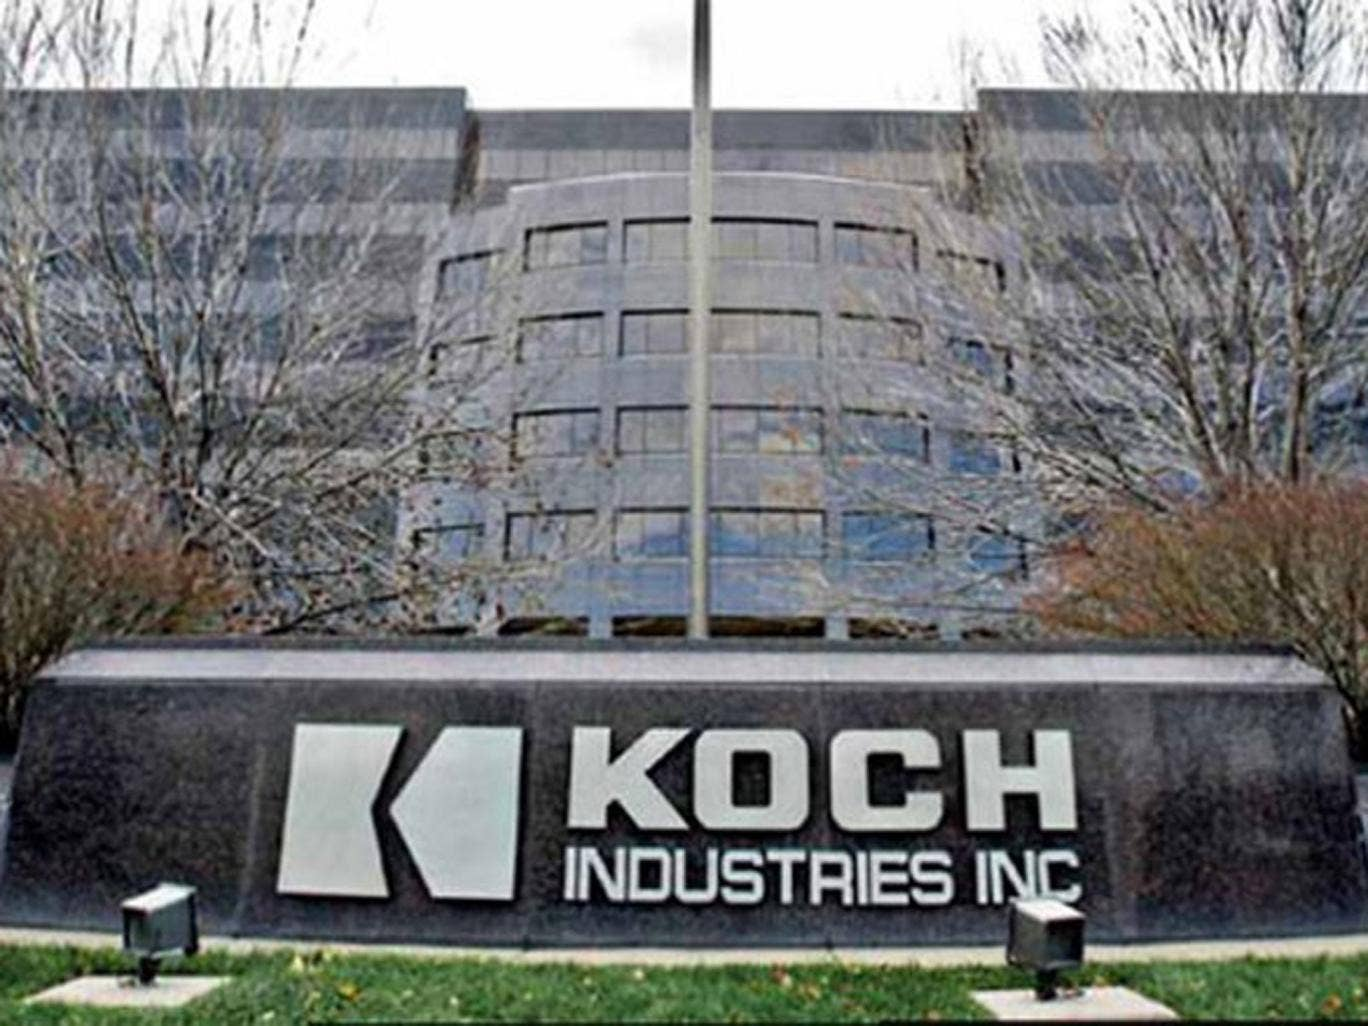 The headquarters of Koch Industries in Wichita, Kansas